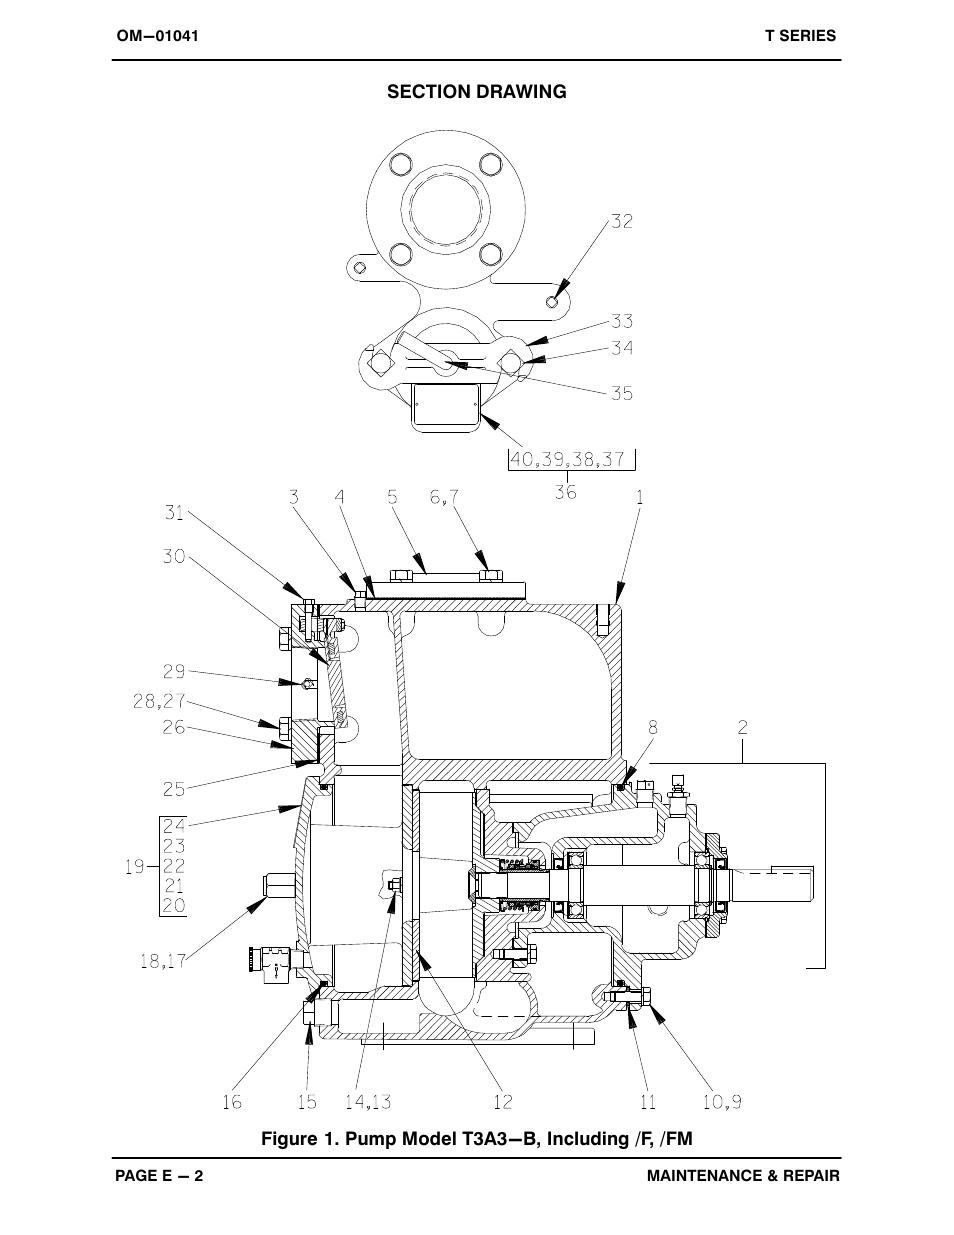 figure 1  pump model t3a3 f    fm